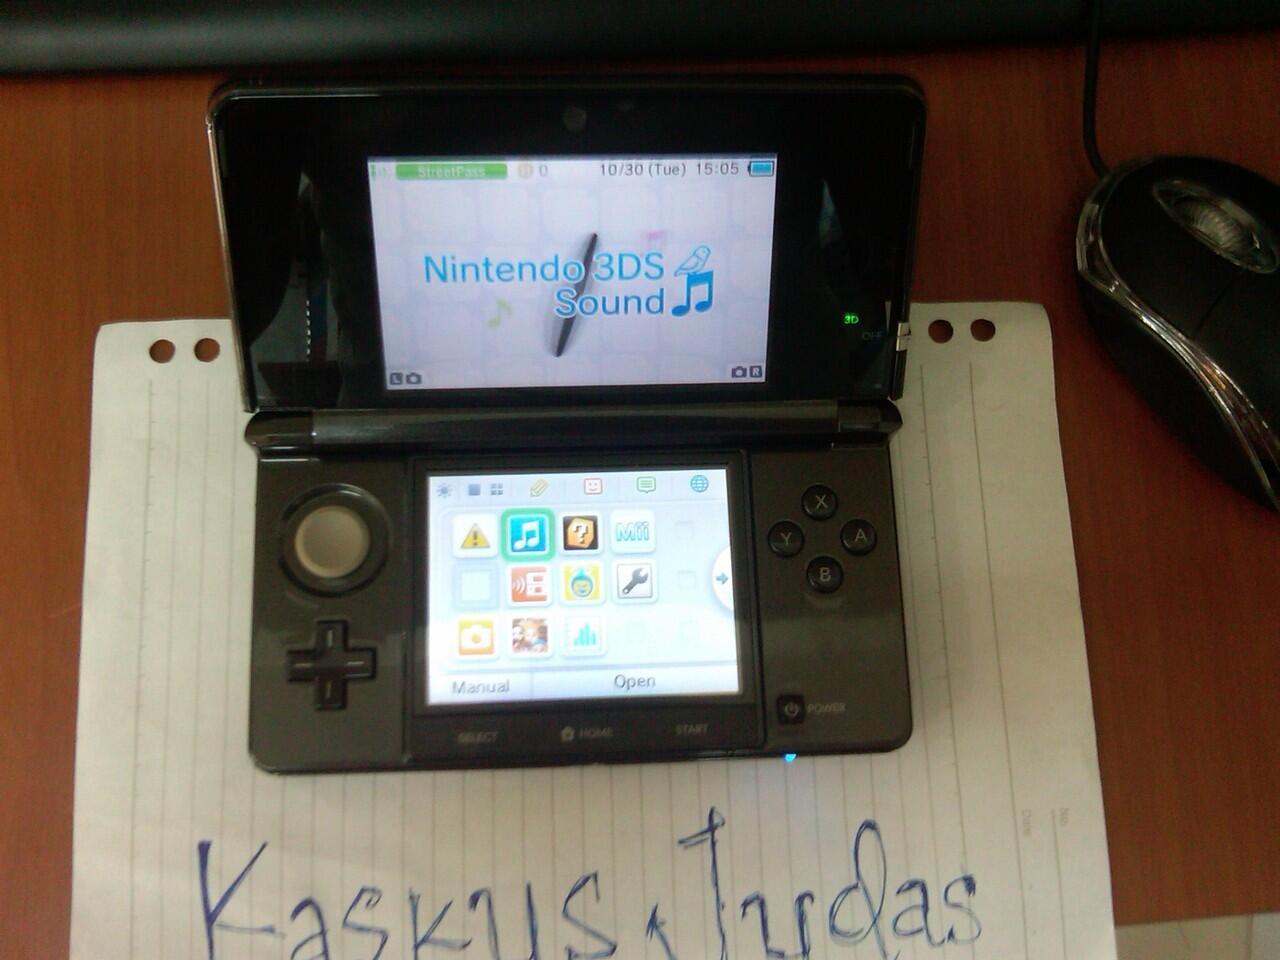 Nintendo 3DS Cosmo Black Murah ( like new )